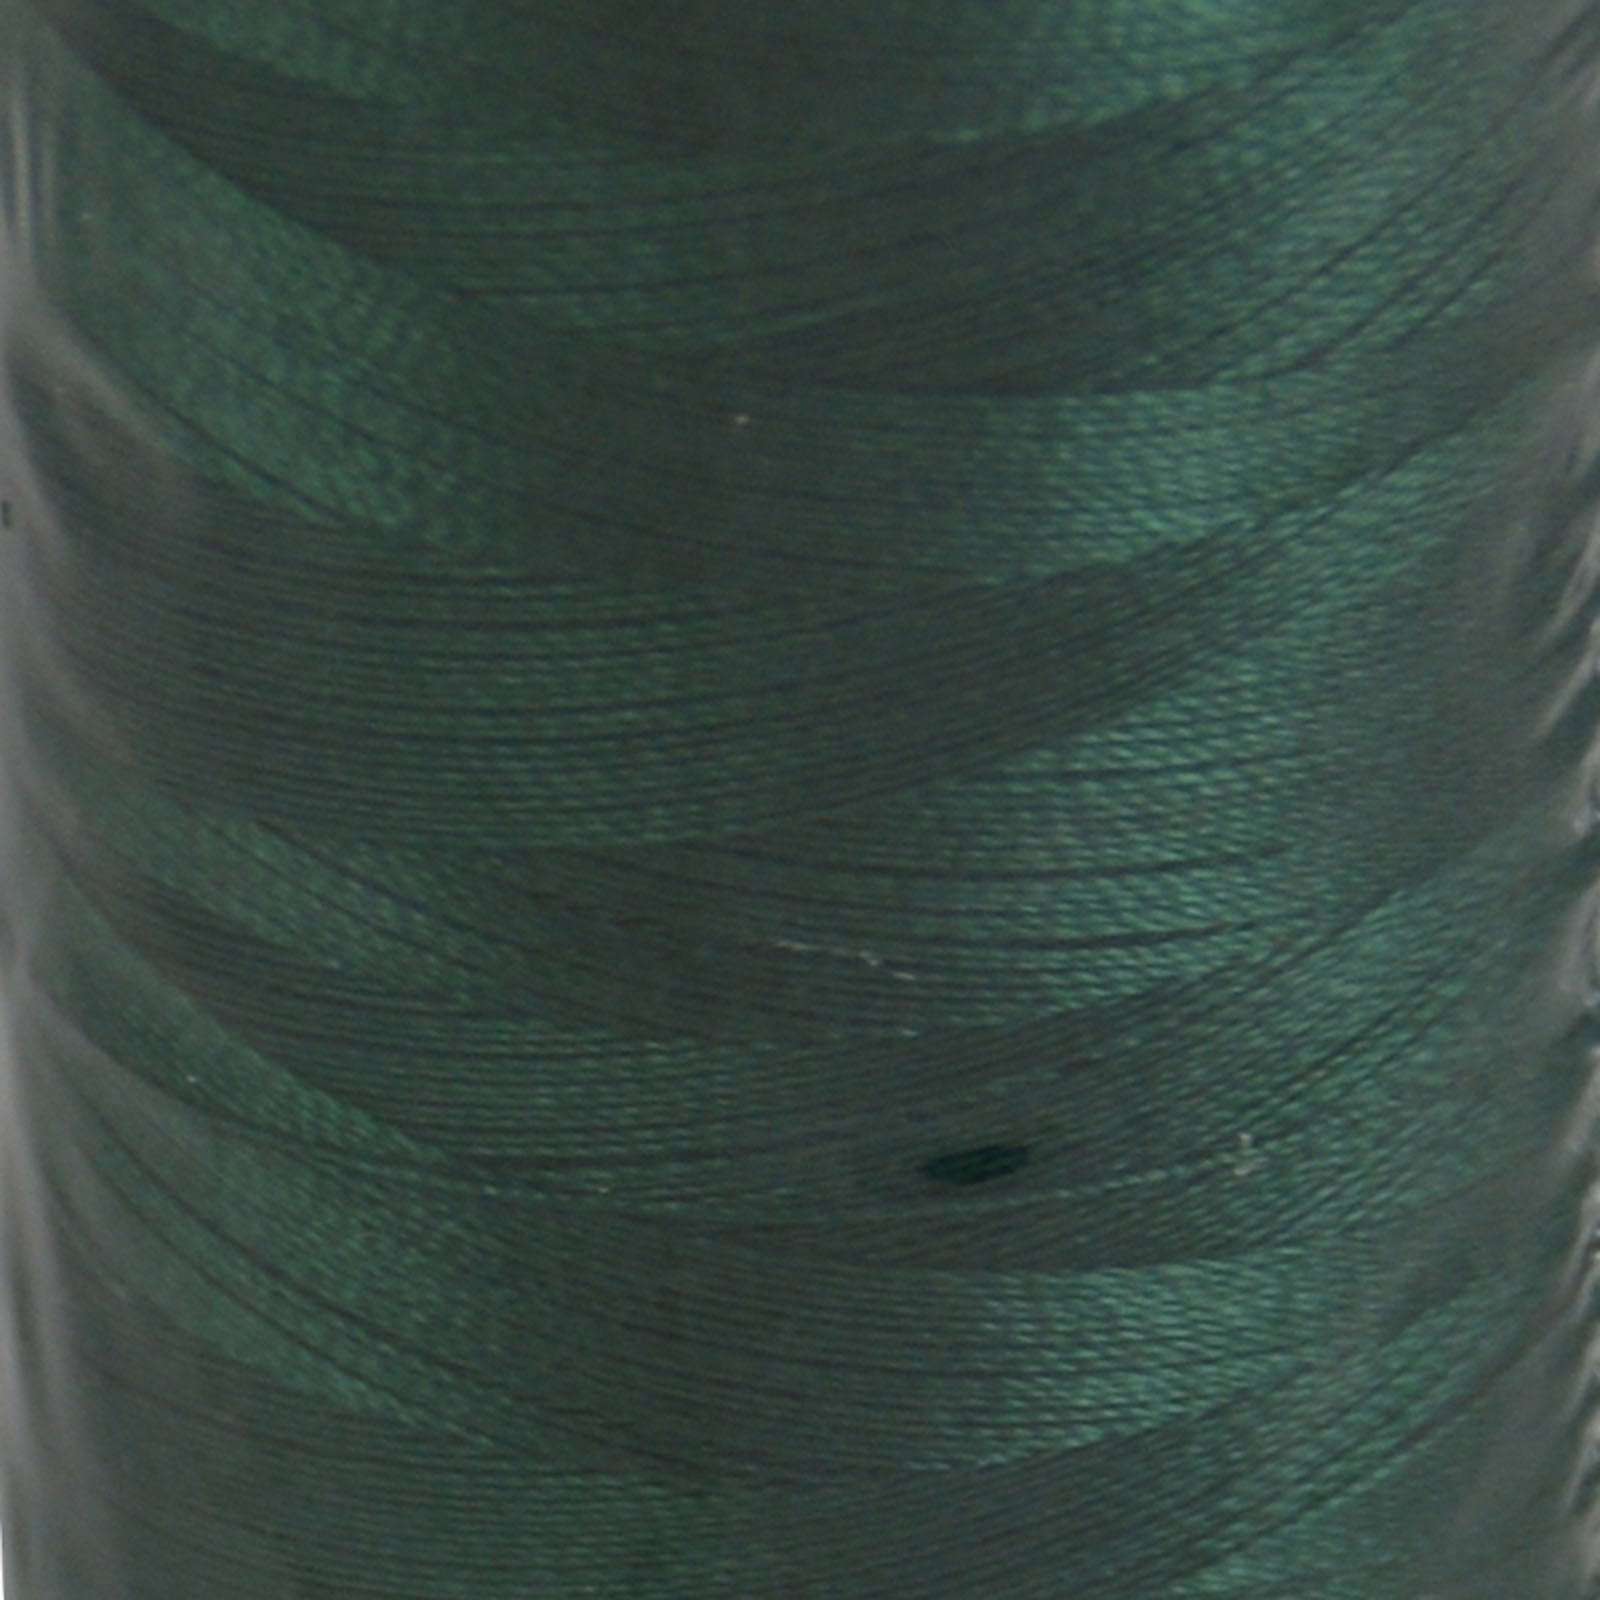 # 2885 Medium Spruce